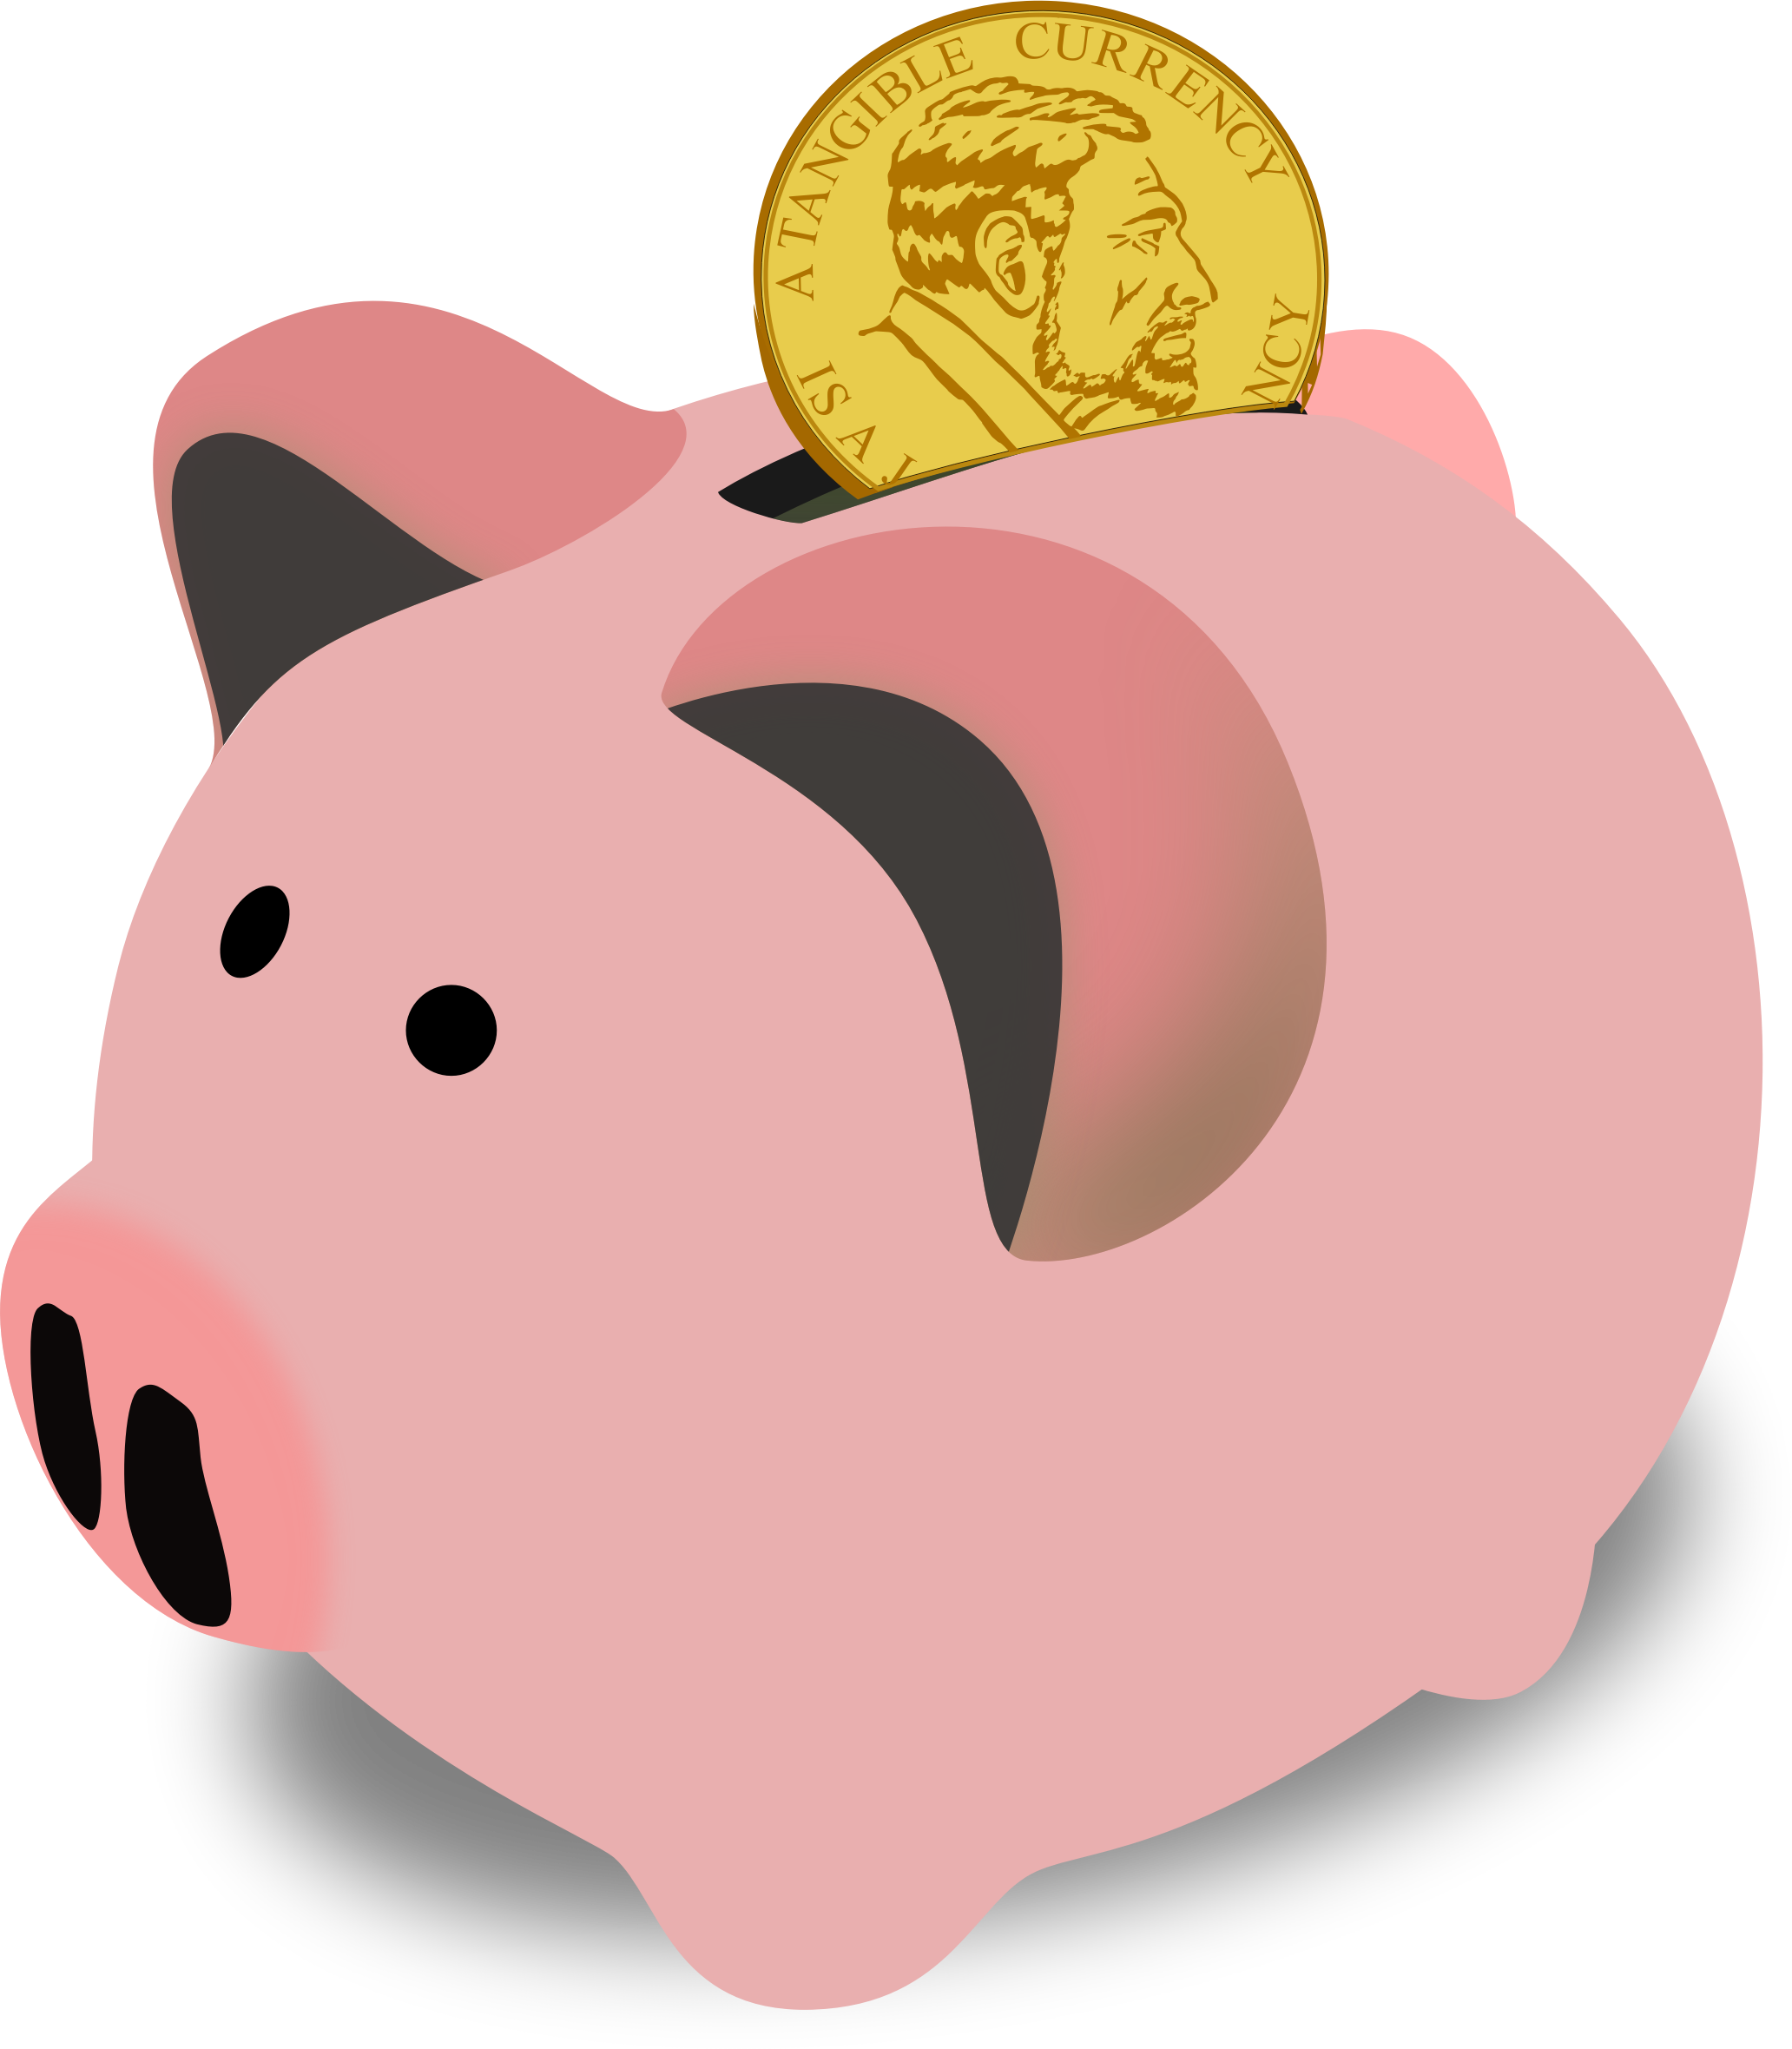 Money clipart banking. Piggy bank big image